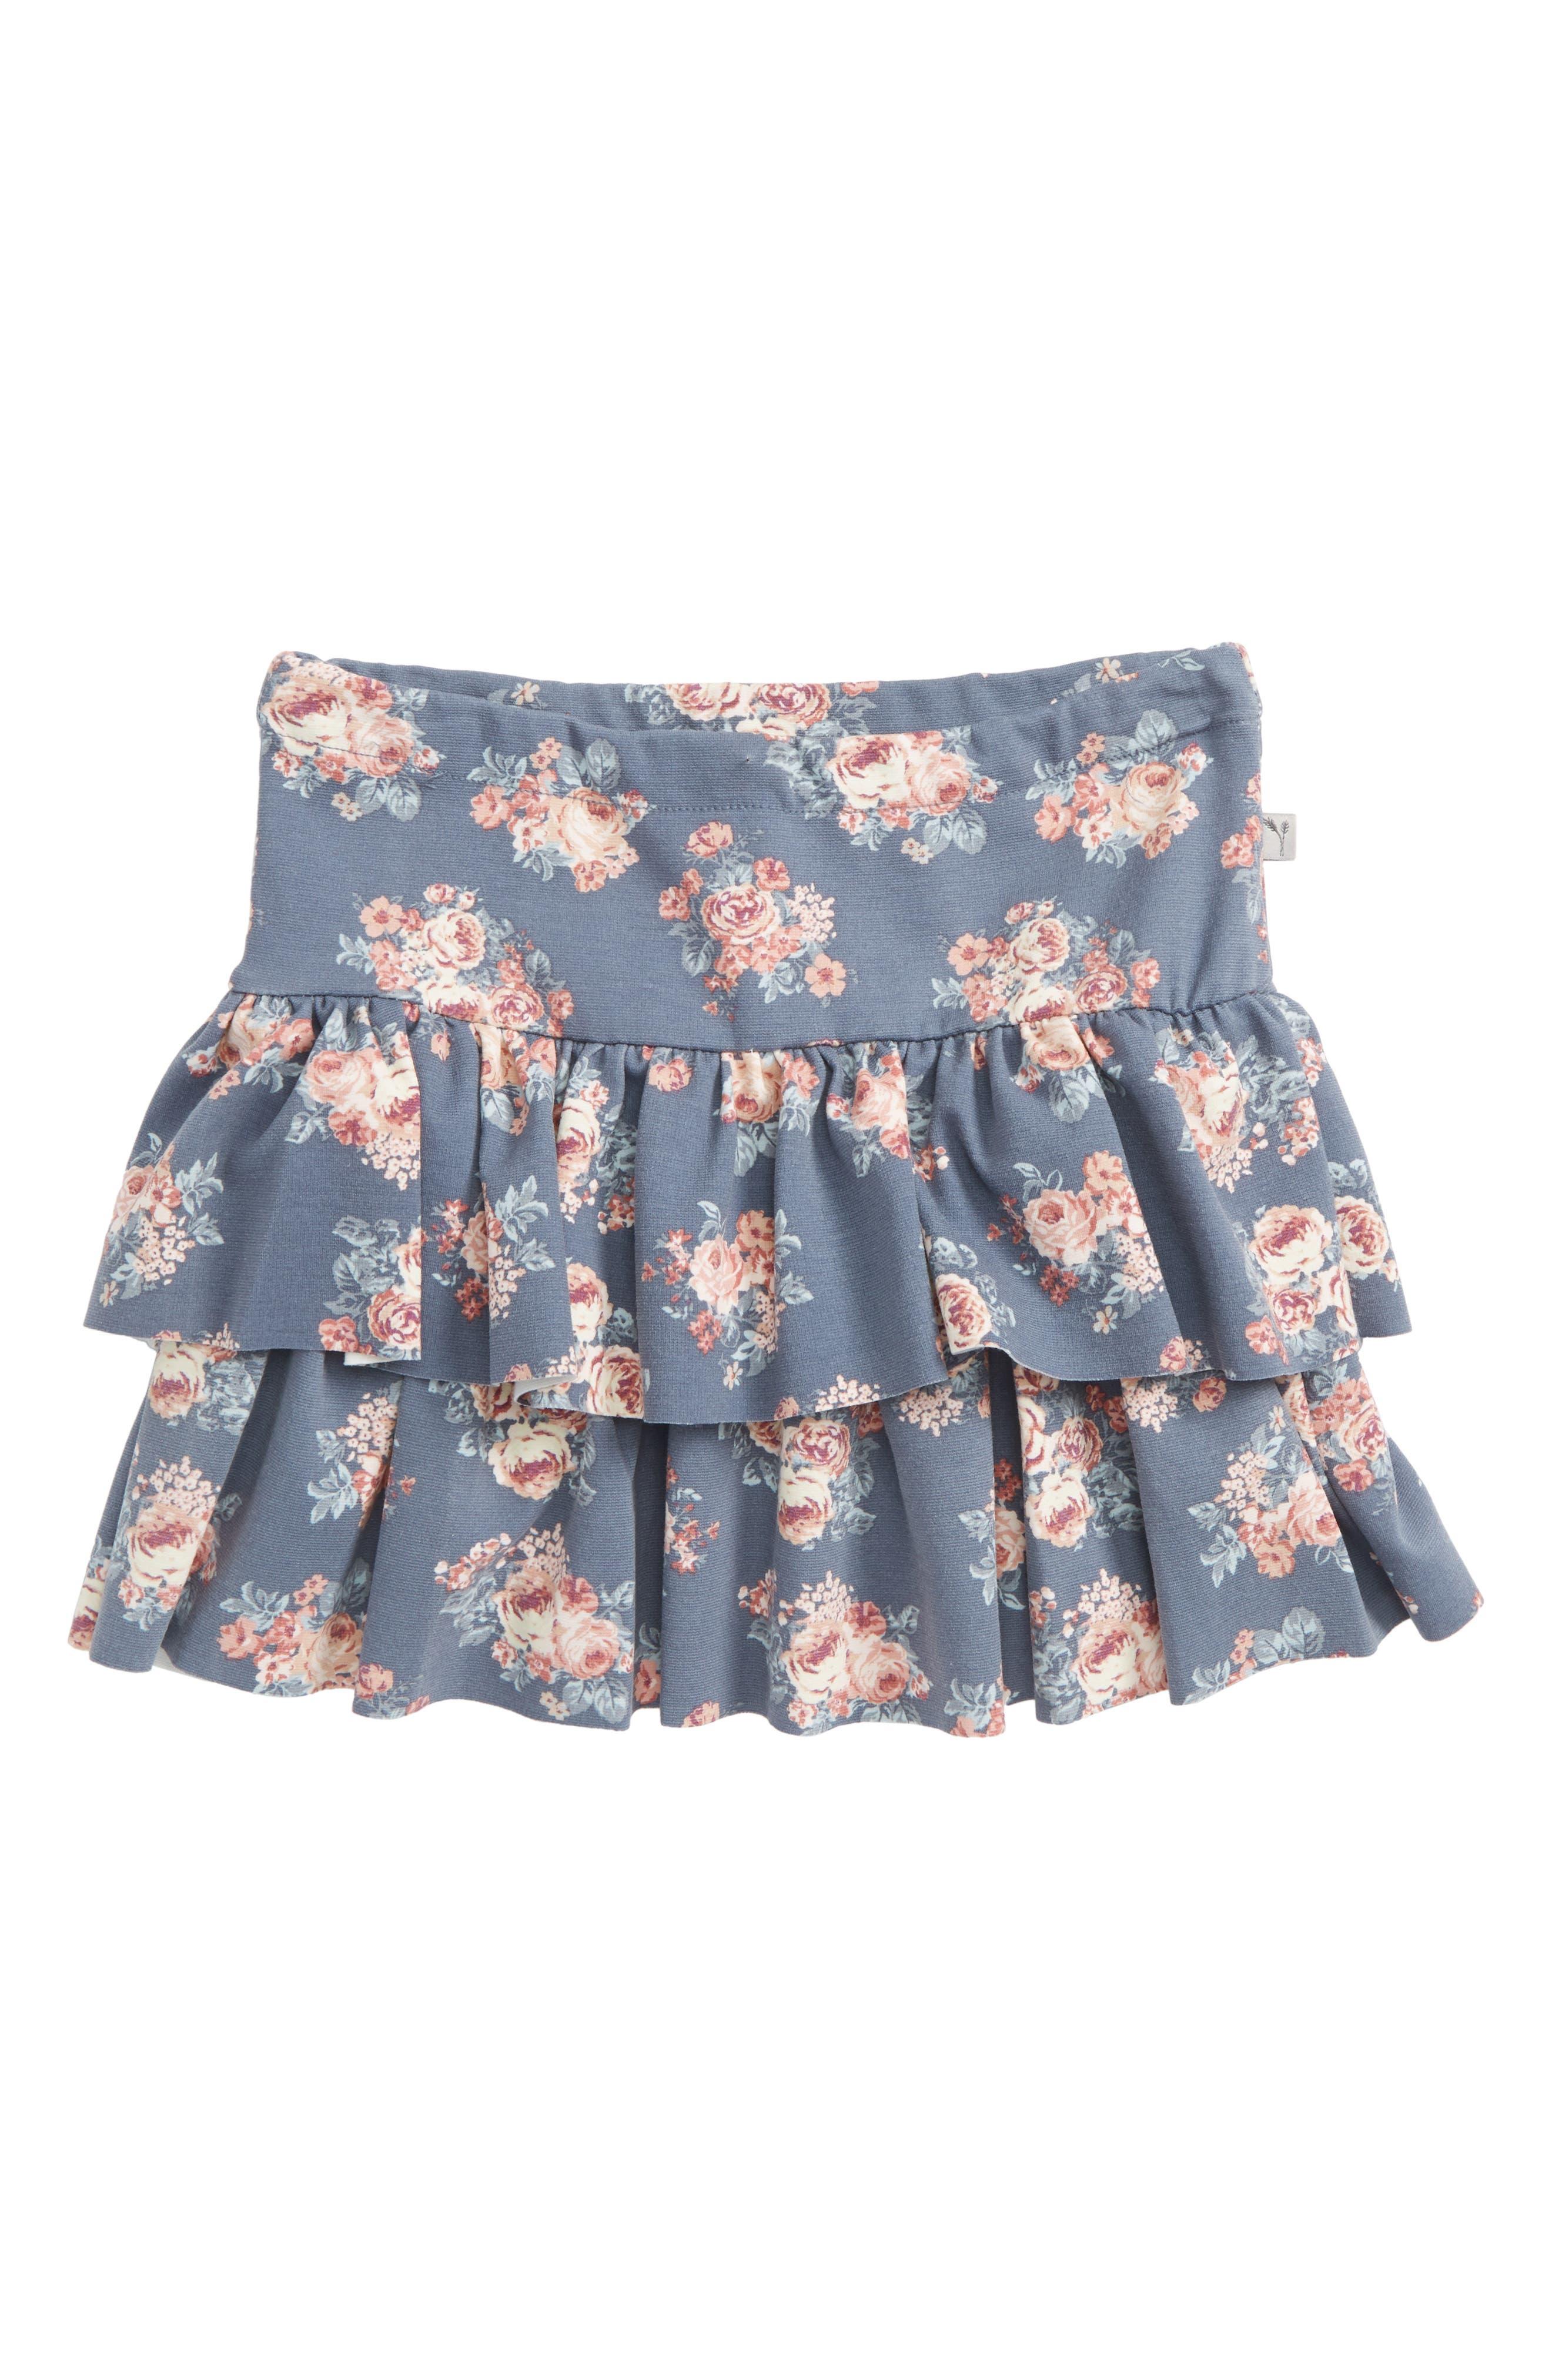 Jersey Ruffle Skirt,                             Main thumbnail 1, color,                             Grey